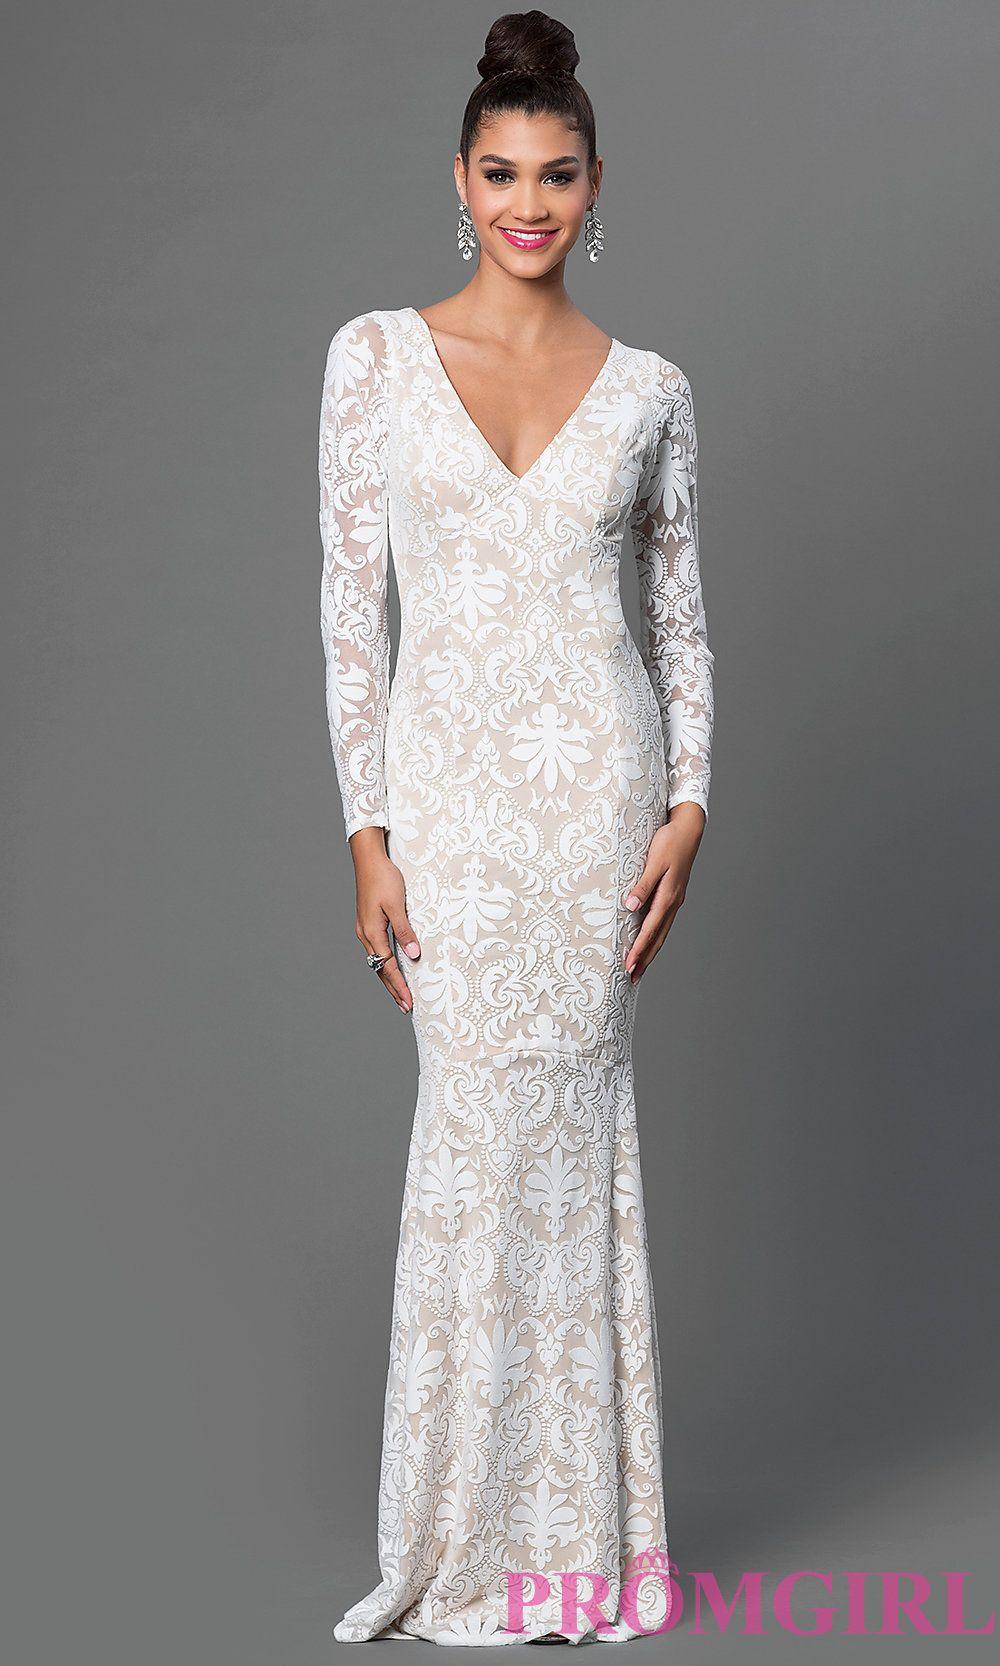 Swatchattribute bridesmaids ideas pinterest white